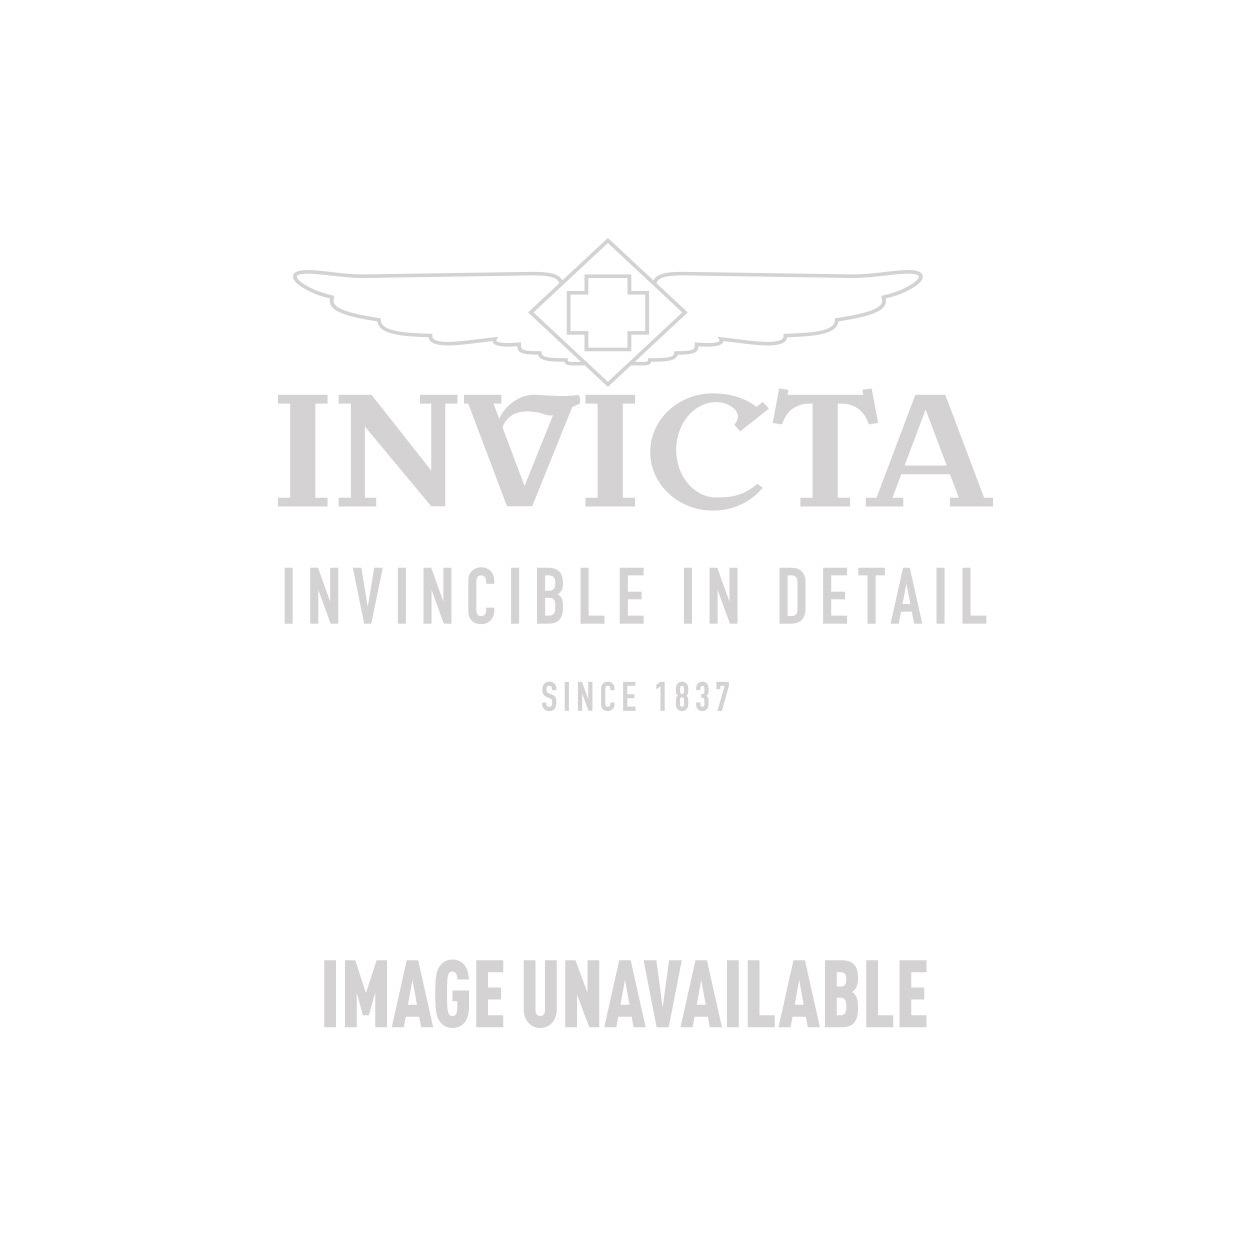 Invicta JT Swiss Made Quartz Watch - Black, Titanium, Sandblast case with Black tone Stainless Steel band - Model 14515